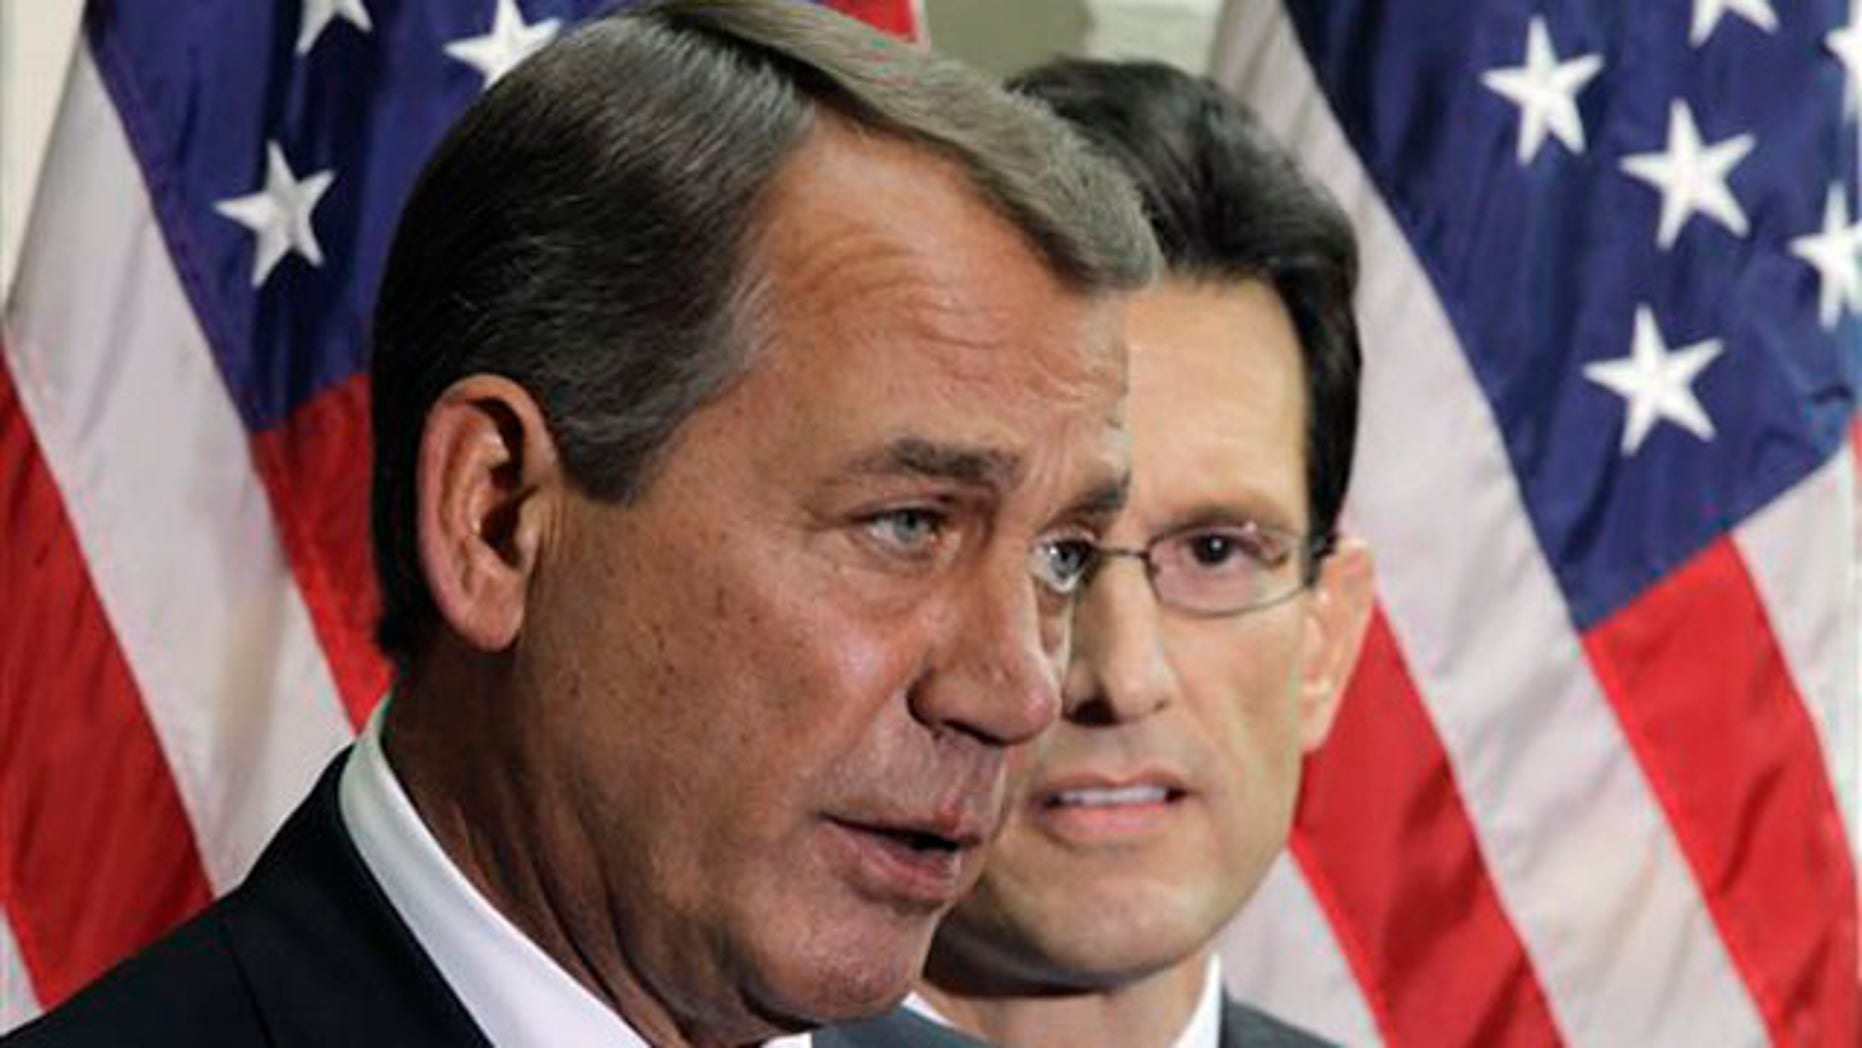 House Speaker John Boehner, accompanied by House Majority Leader Eric Cantor, speaks to reporters Jan. 25 in Washington.